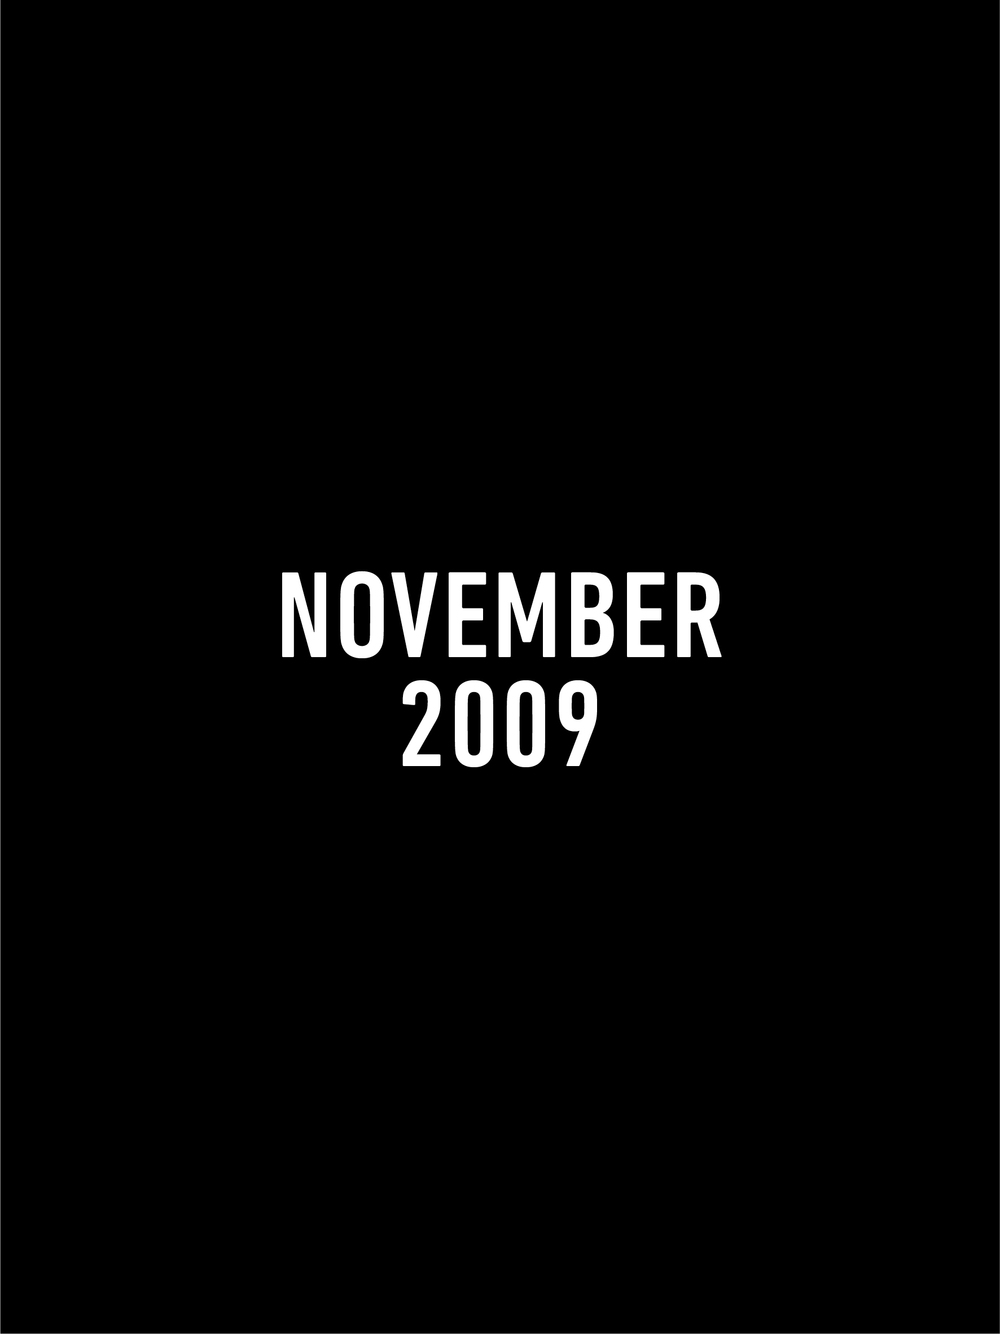 2009 monthly11.jpg